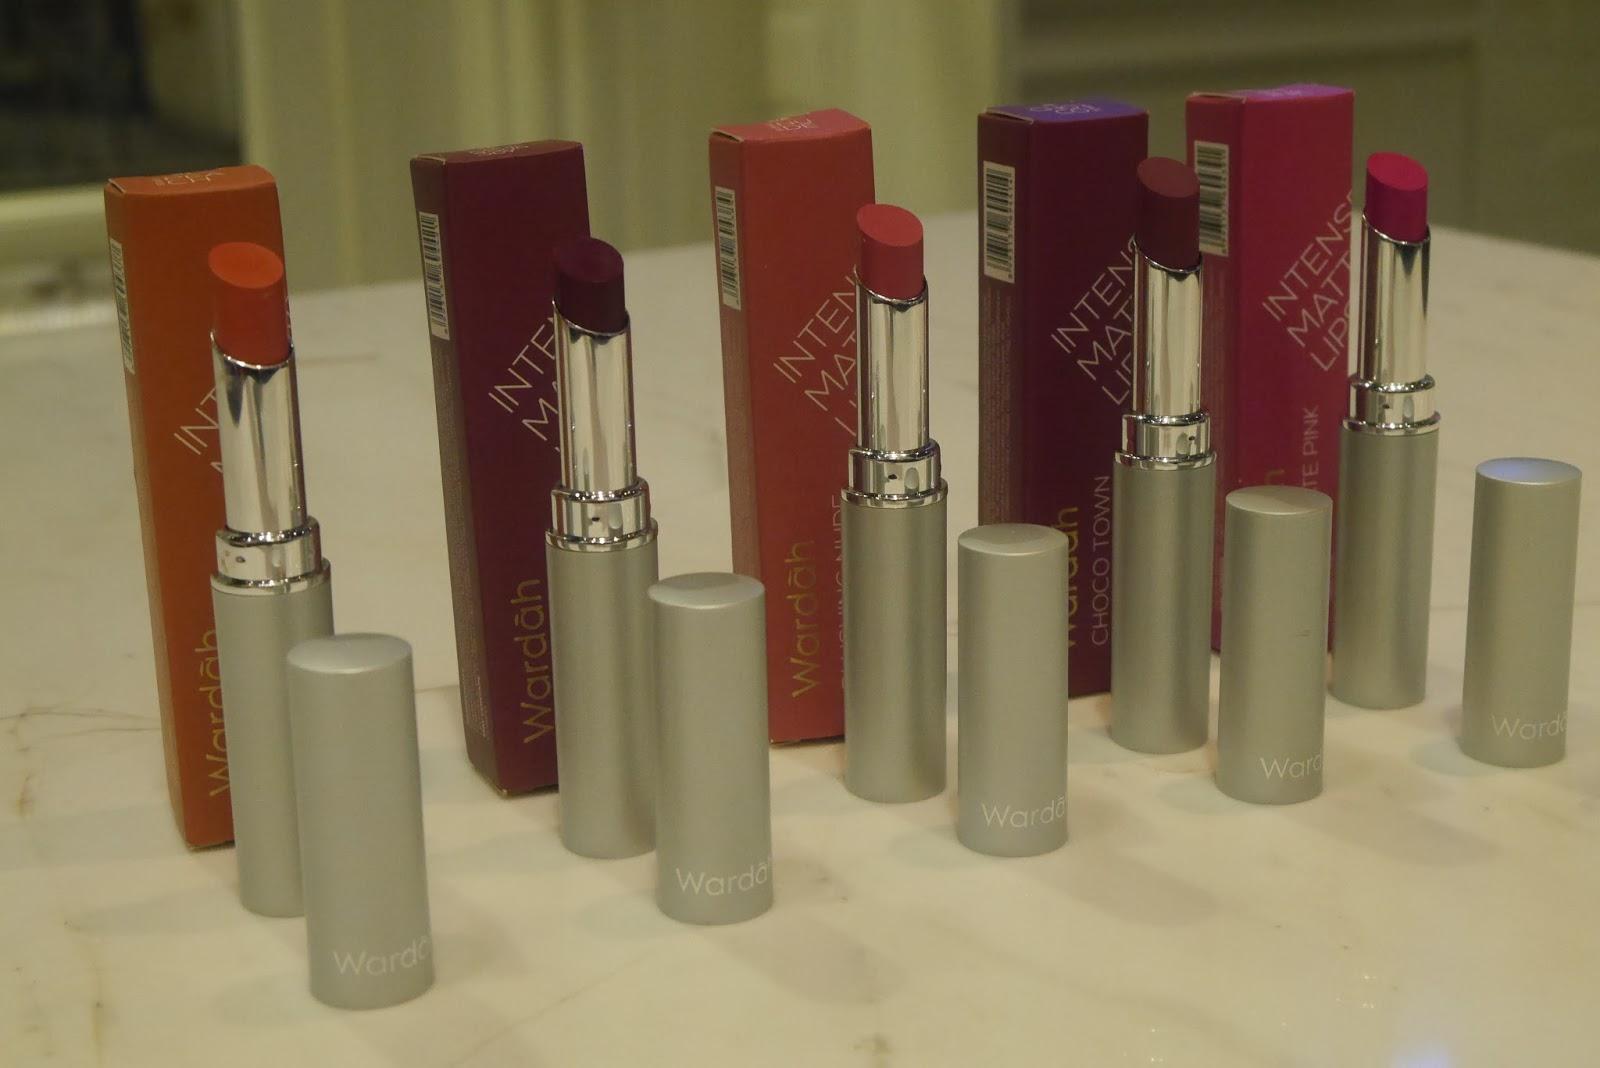 Wardah Intense Matte Lipstick 11 Choco Town Daftar Harga Termurah Passionate Pink 07 25gr Yaitu 1 Socialite Peach 2